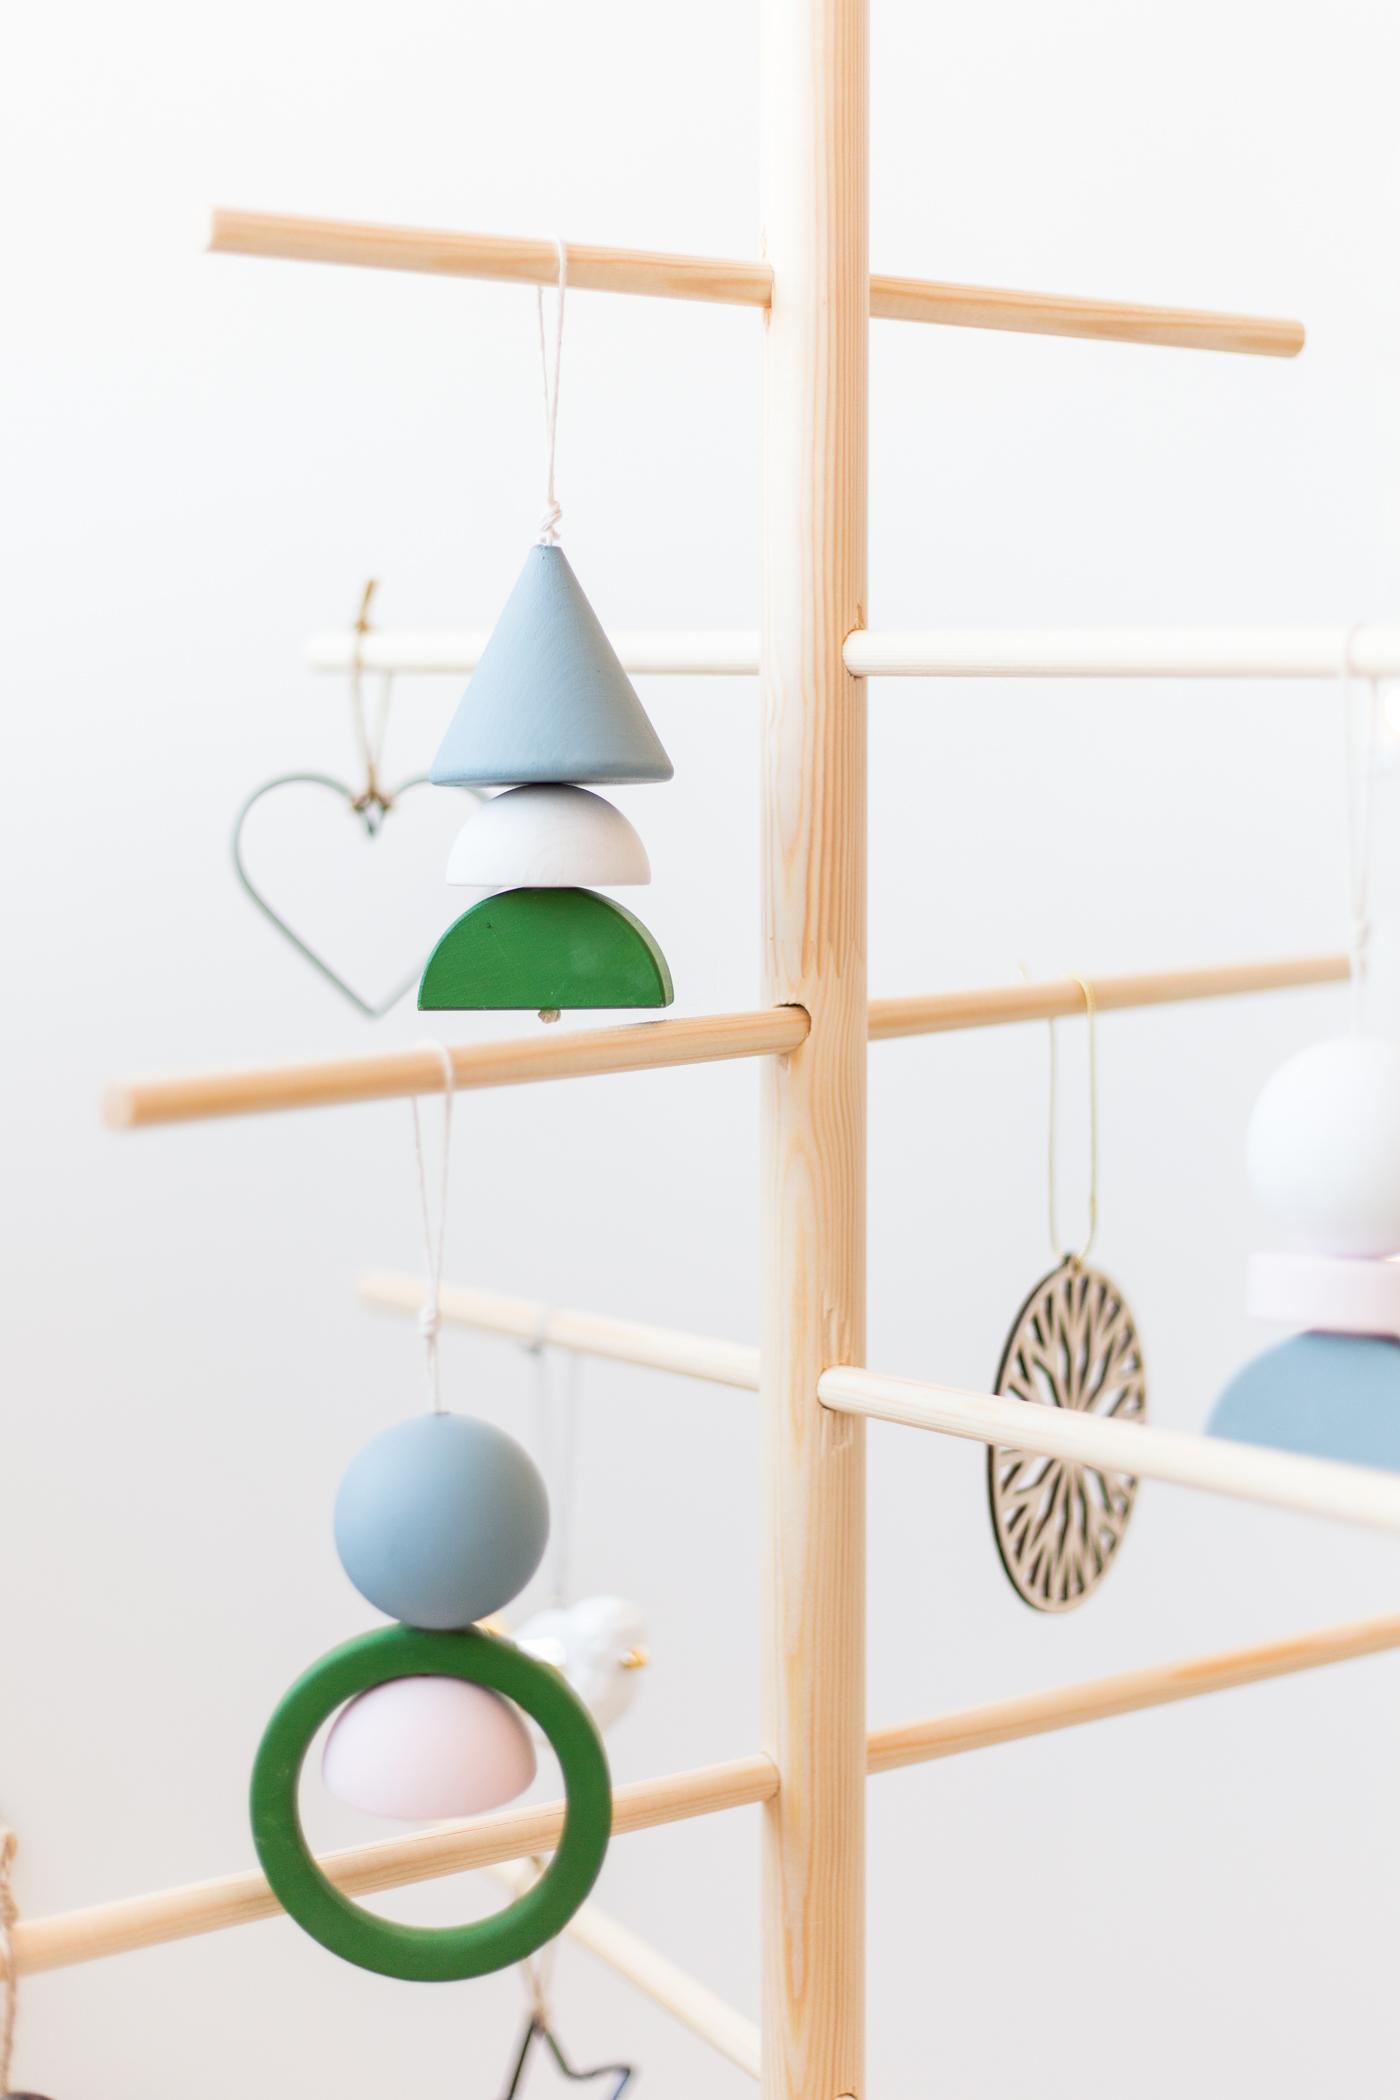 DIY Contemporary Wood Block Hanging Christmas Decorations